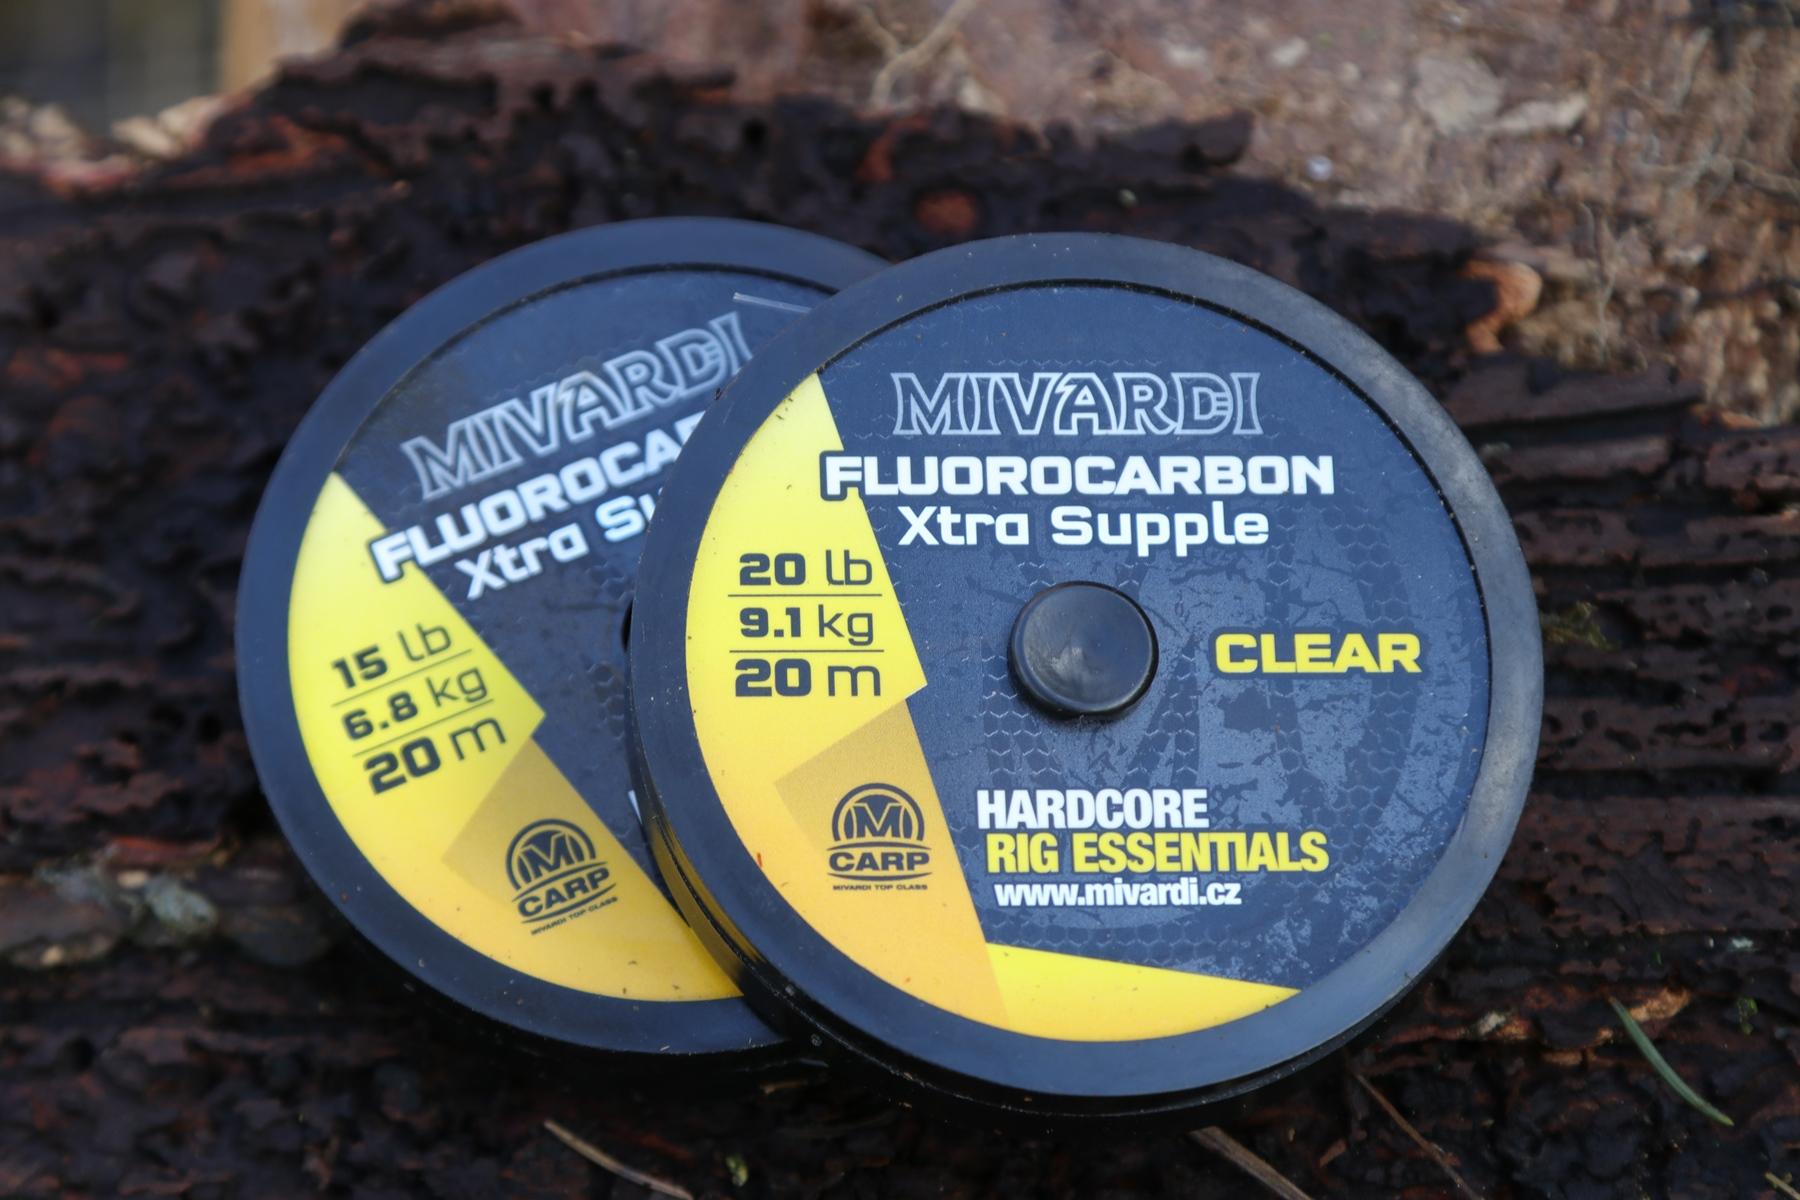 Fluorocarbon Mivardi Xtra Supple 20m/10lb